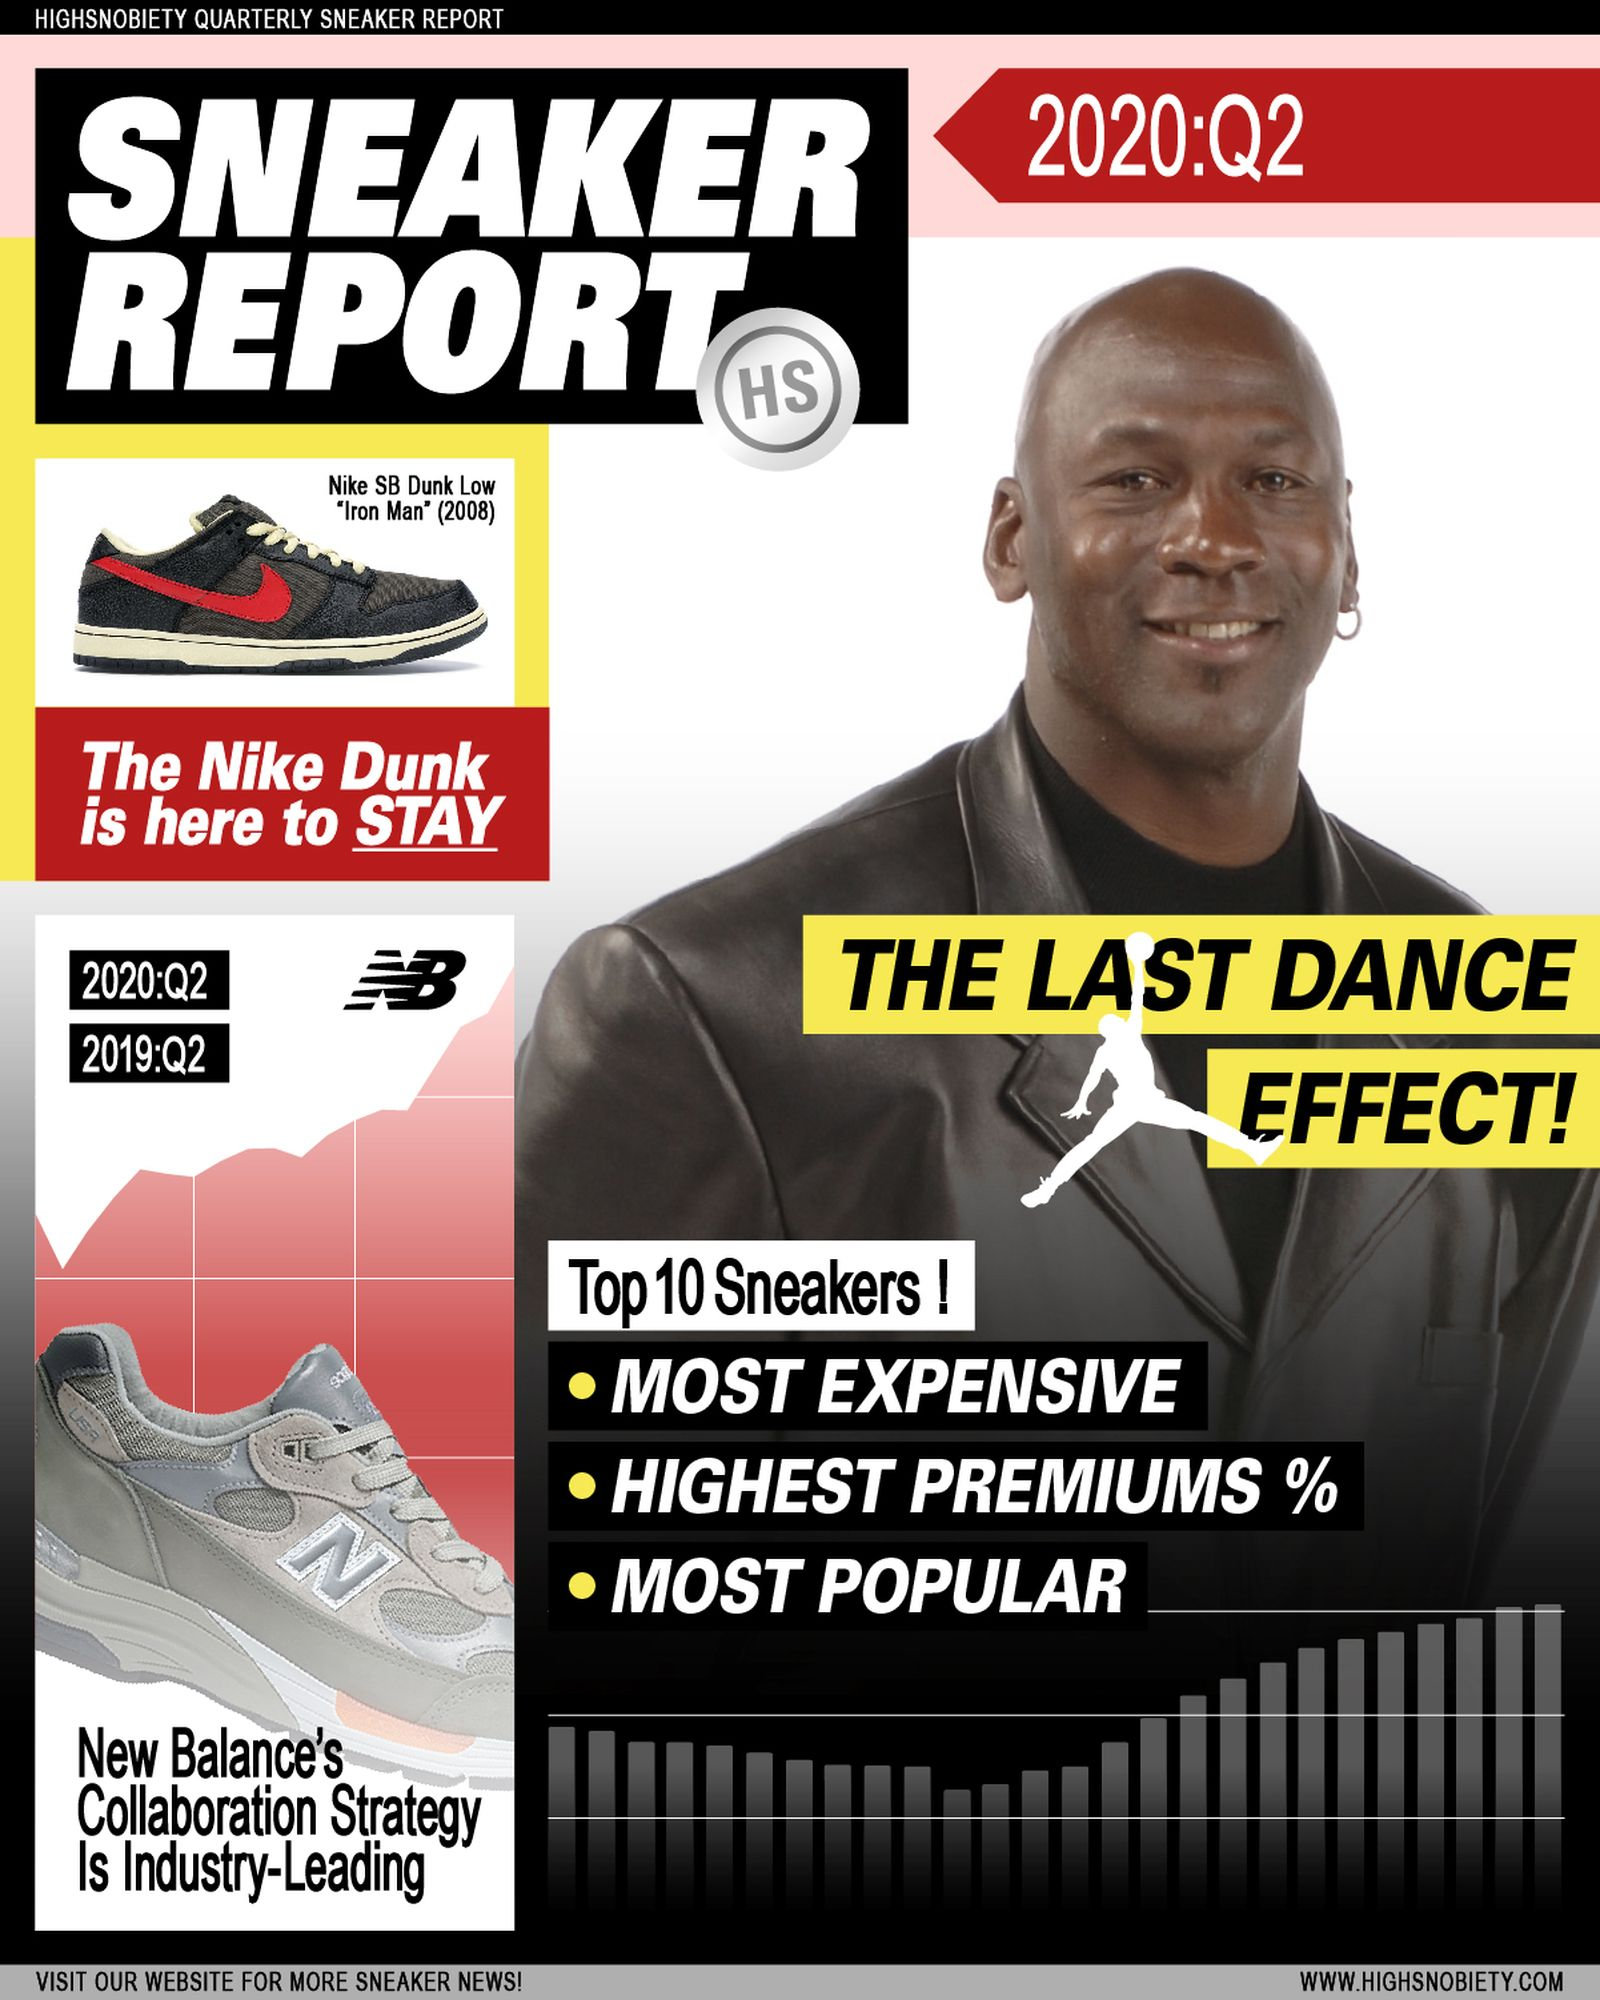 ED_WEB_Q2_Sneaker_Report_cover_1200x1500-01